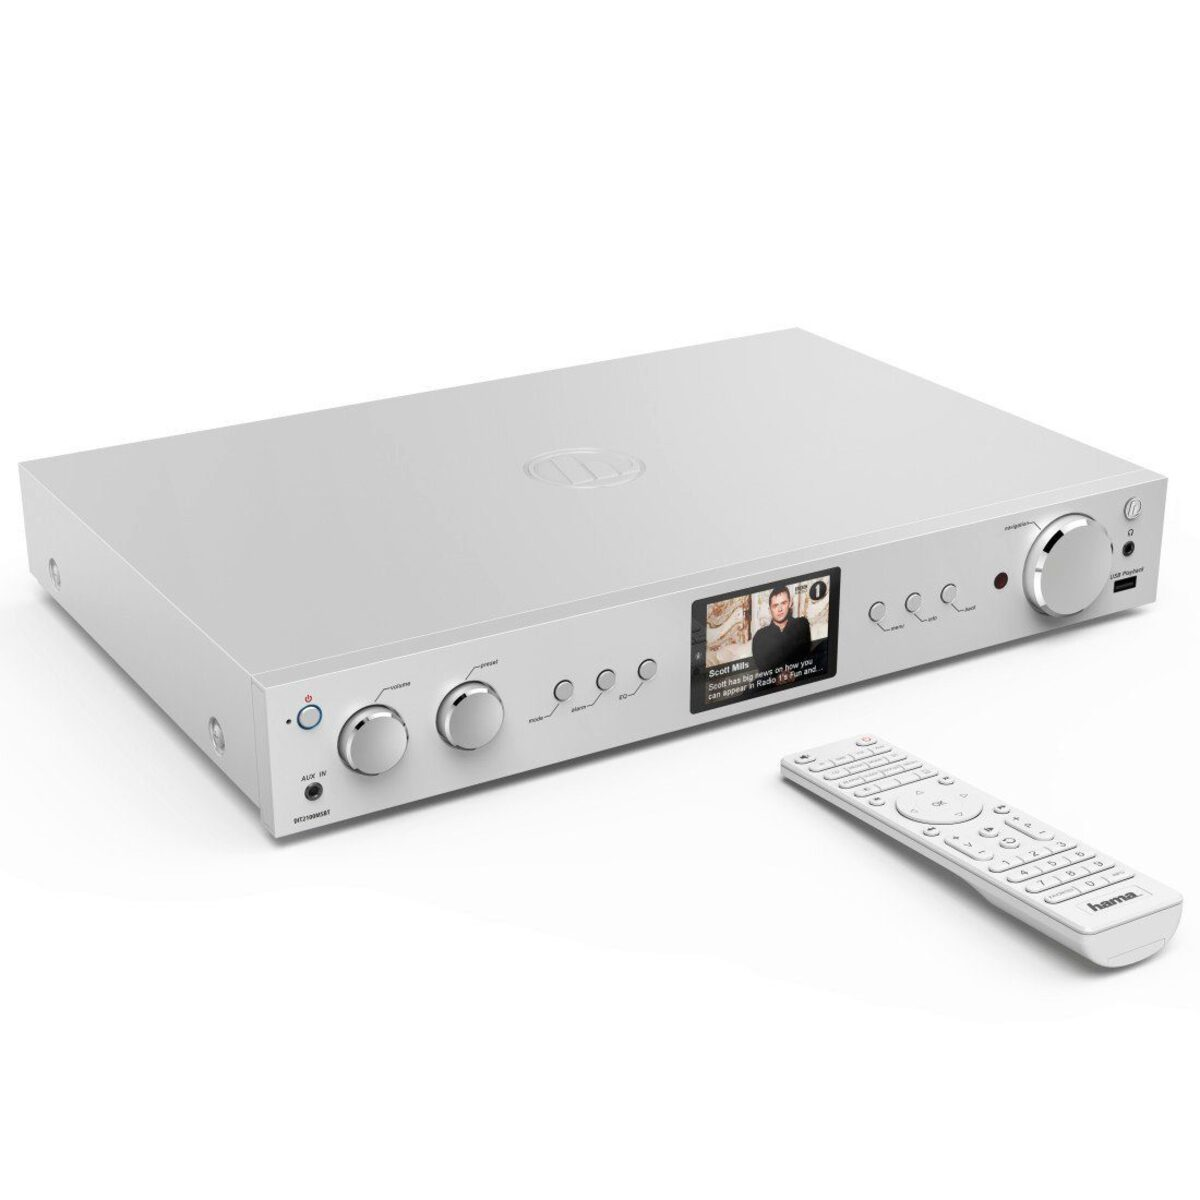 Bild 2 von Hama Digitaltuner, DAB+ Digitalradio/Internetradio/Bluetooth/USB »Aux/DIT2100MSBT«